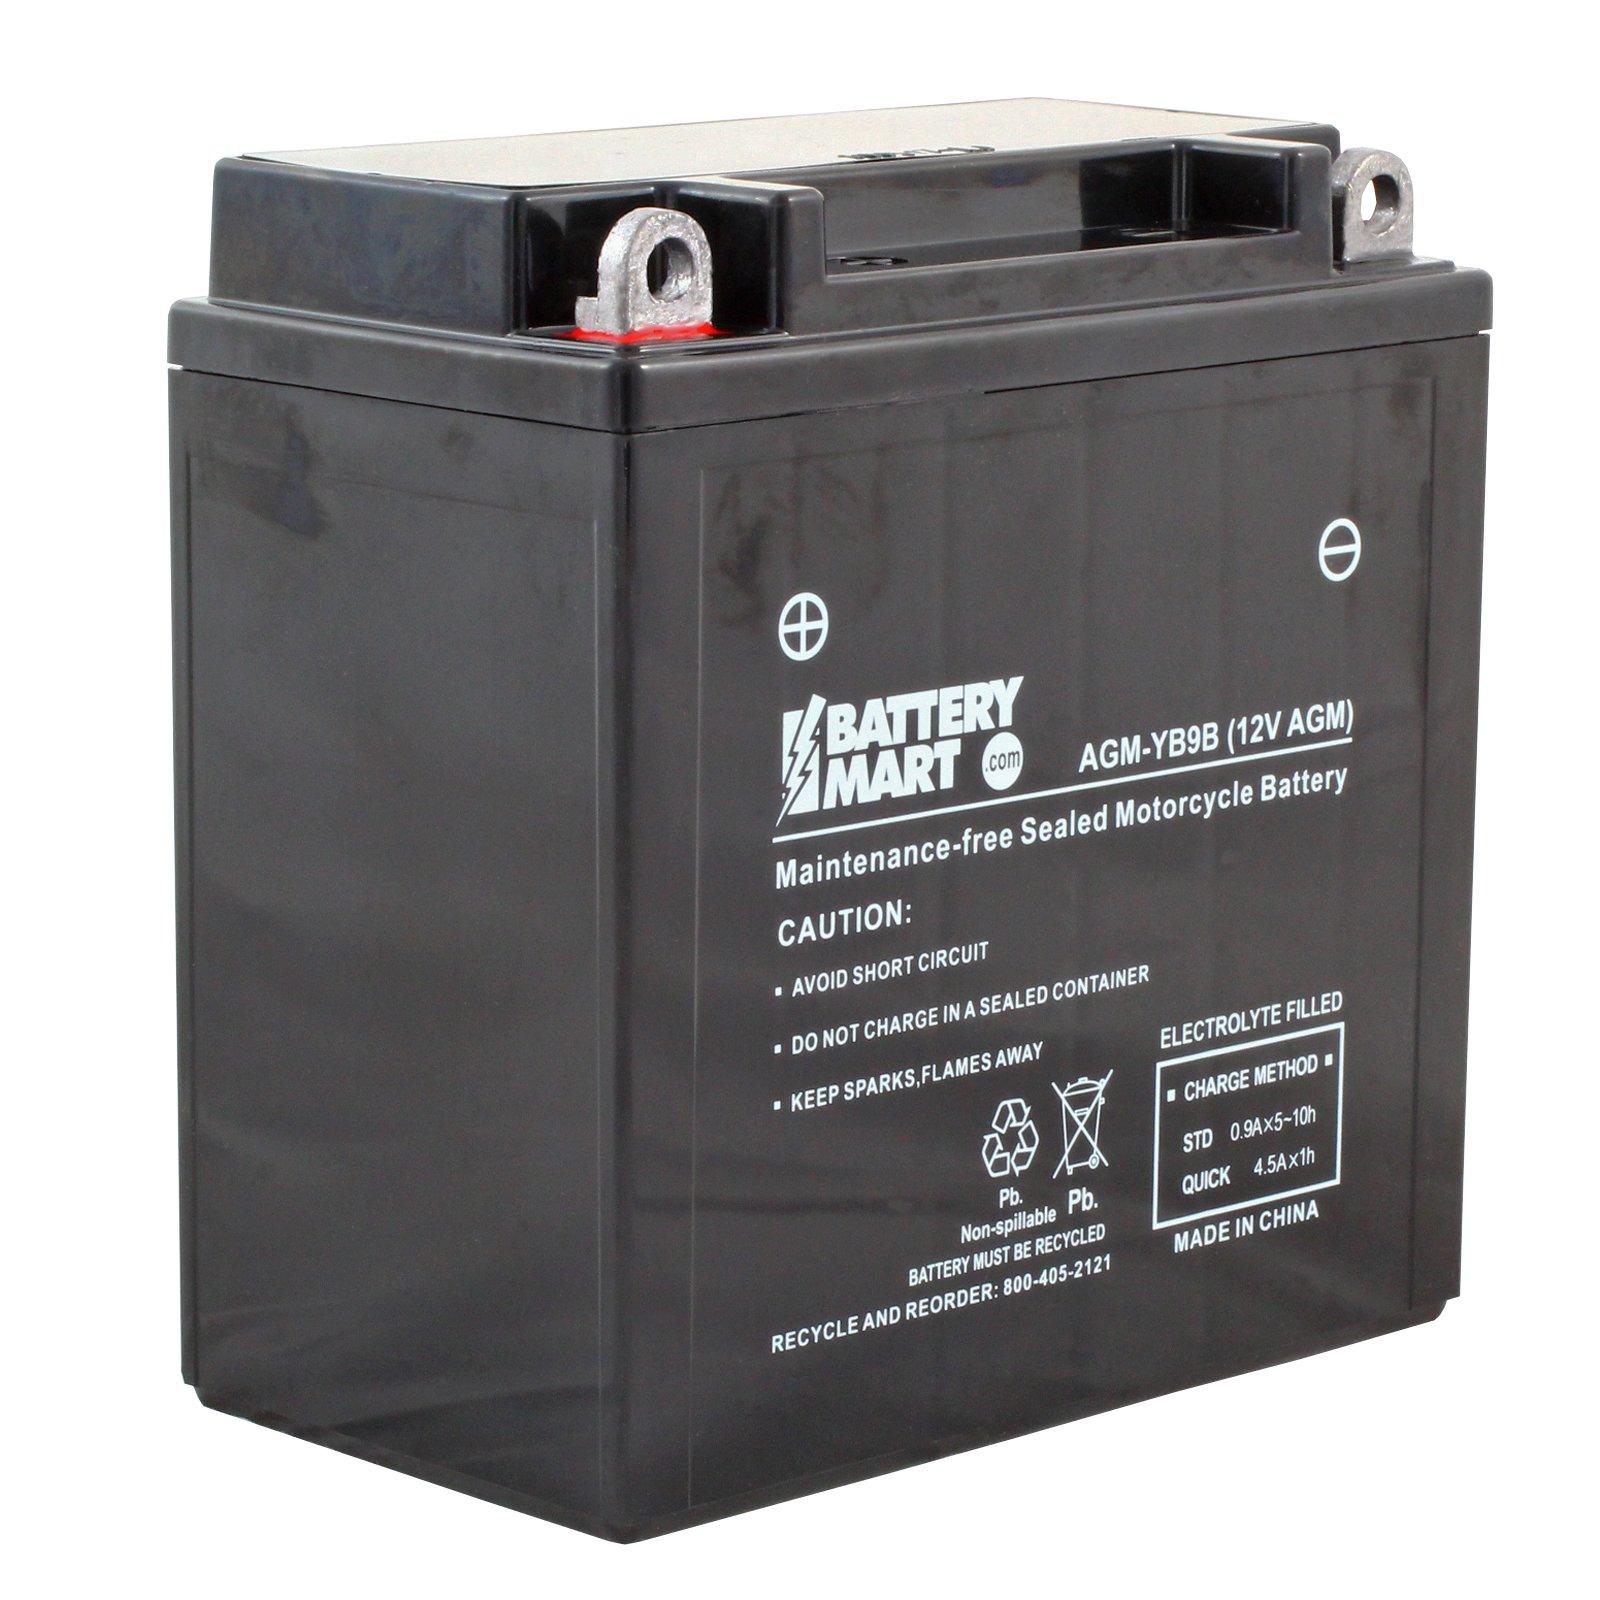 Yb9 B Agm Maintenance Free Battery Free Shipping